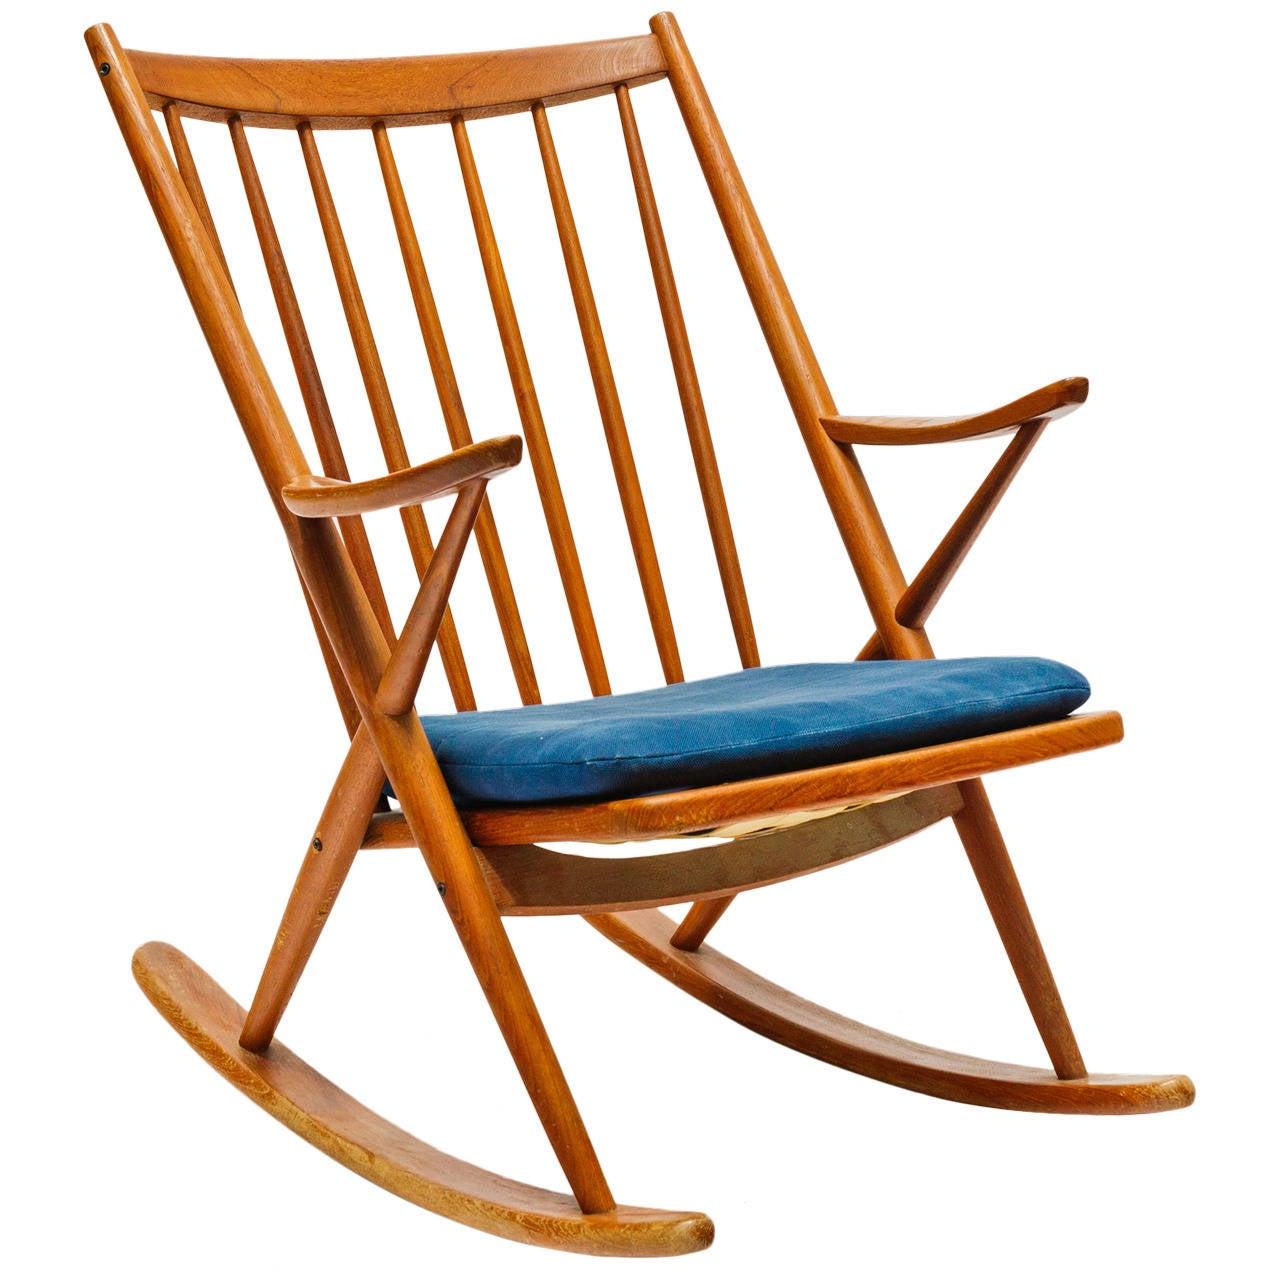 Frank reenskaug rocking chair - Frank Reenskaug Rocking Chair For Bramin 1